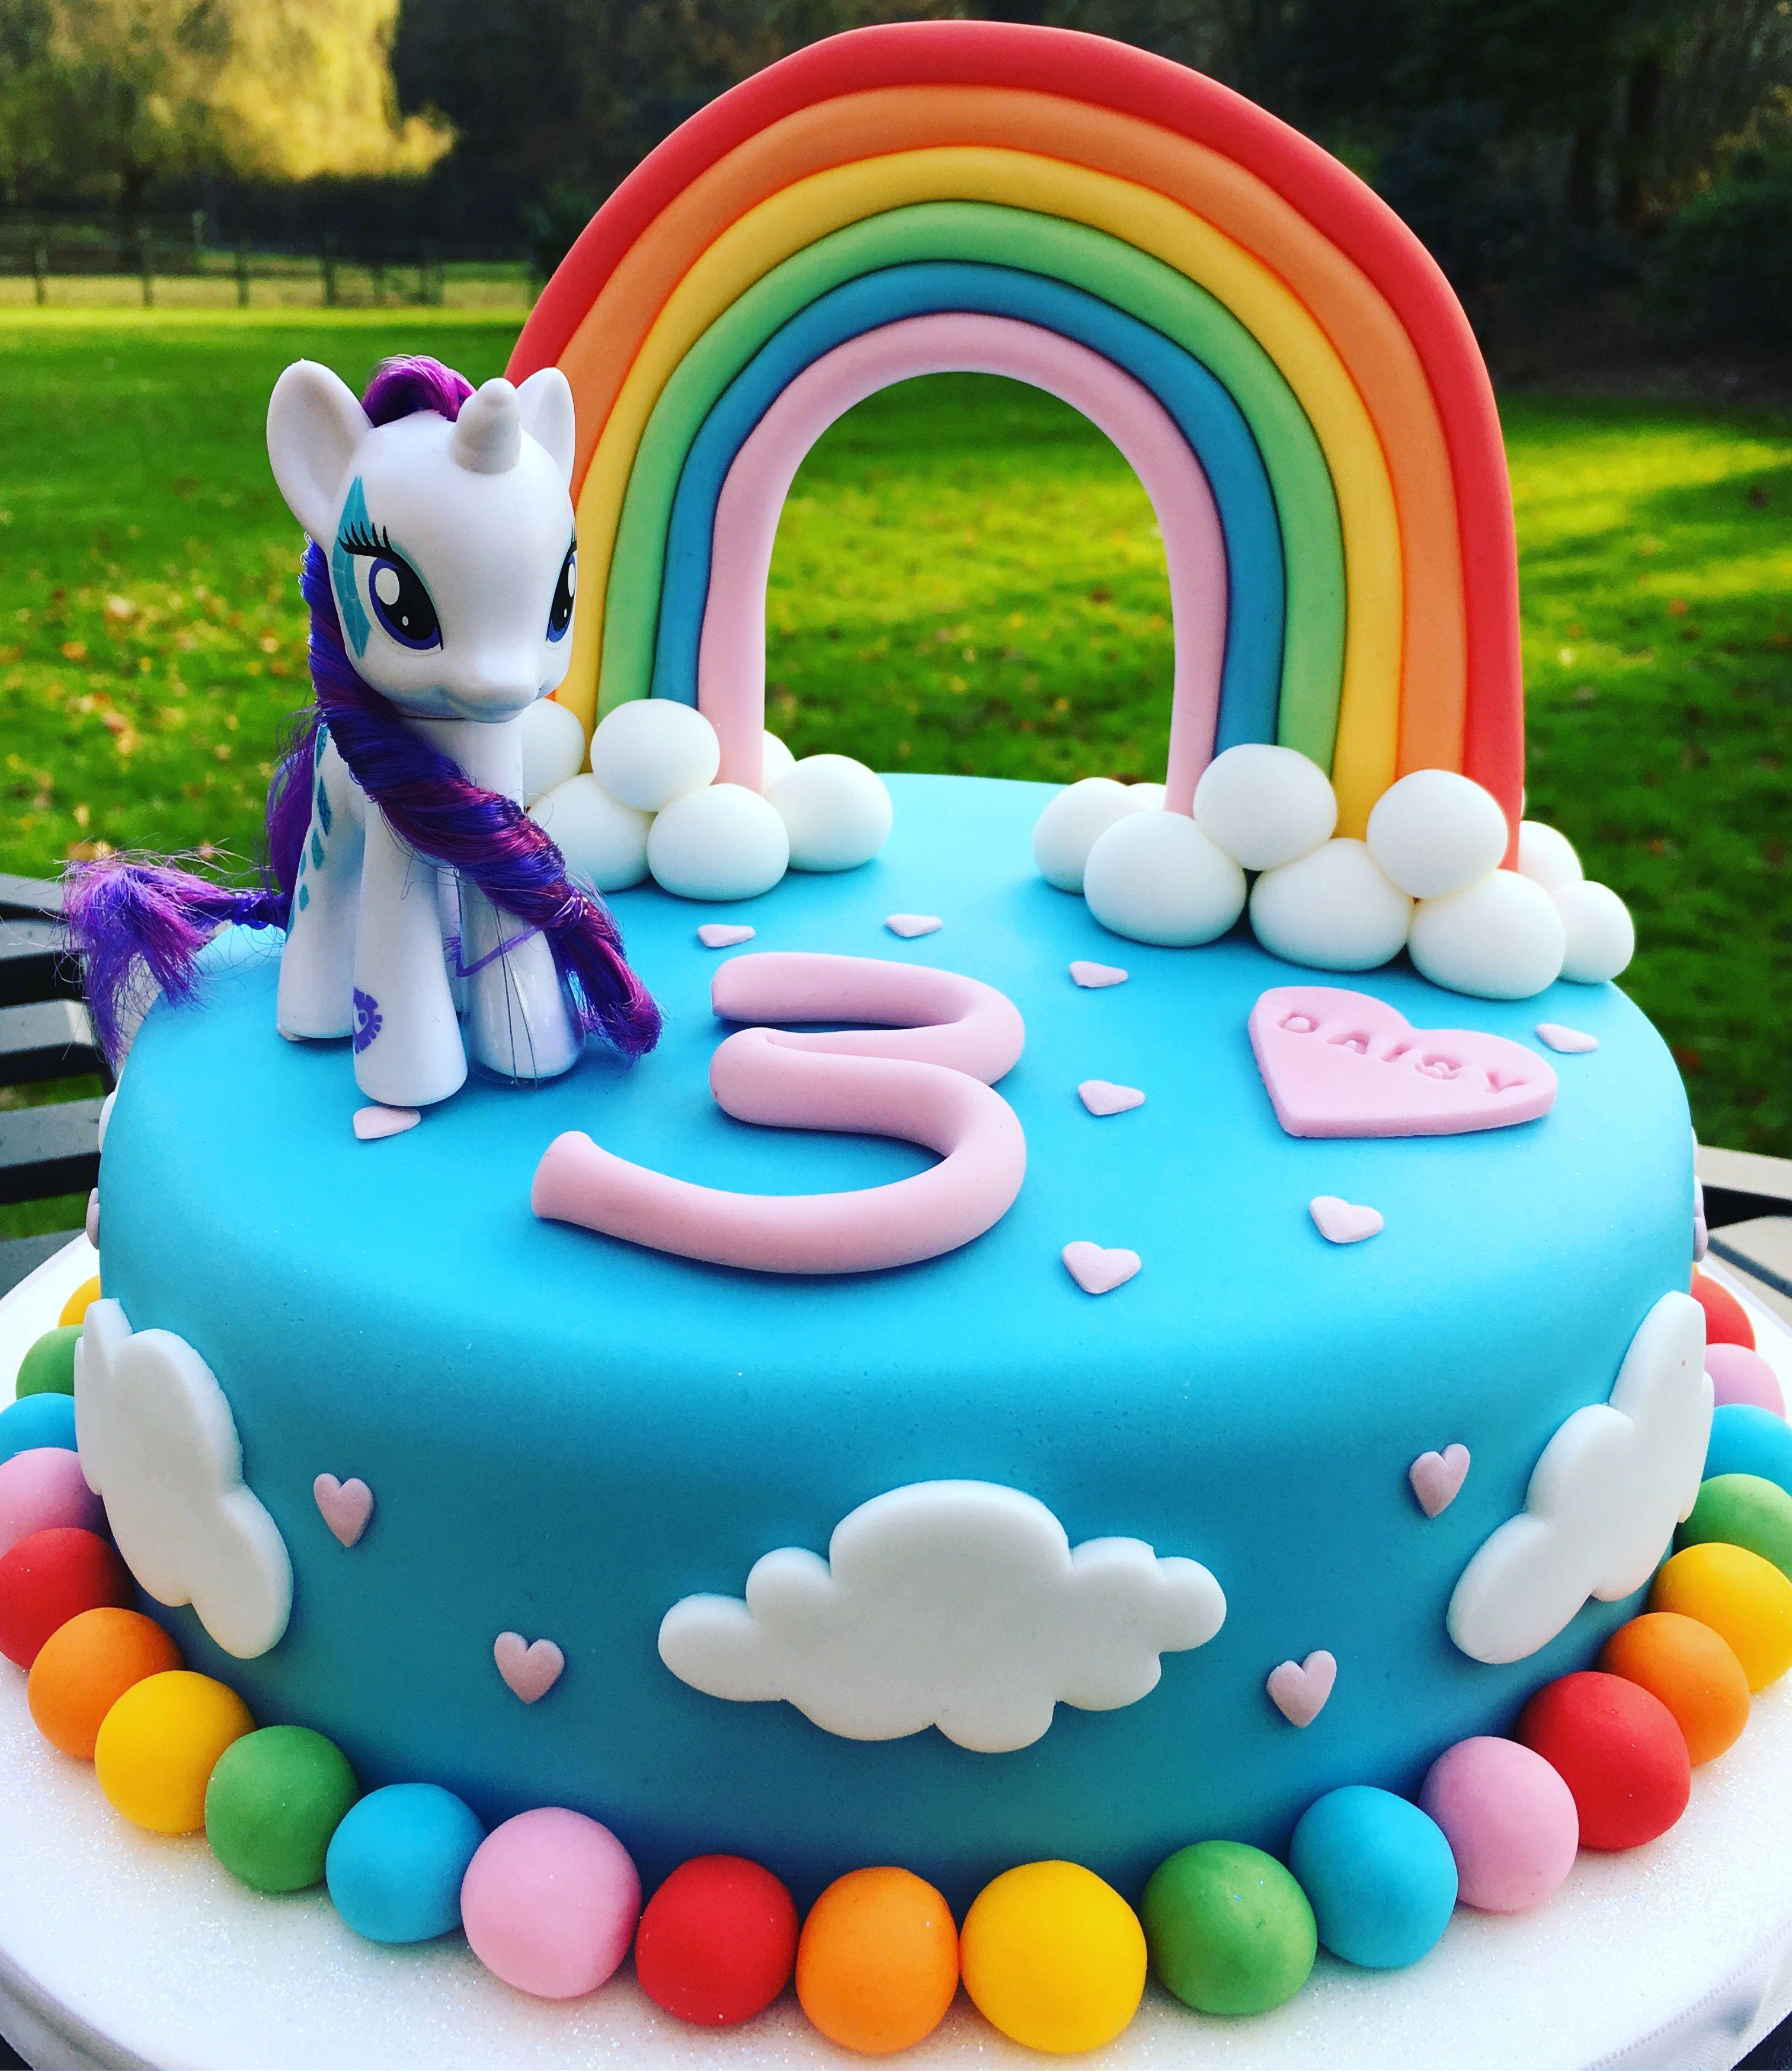 Remarkable My Little Pony Cake With 3D Rainbow Tortas De Pony Pastel De Funny Birthday Cards Online Alyptdamsfinfo